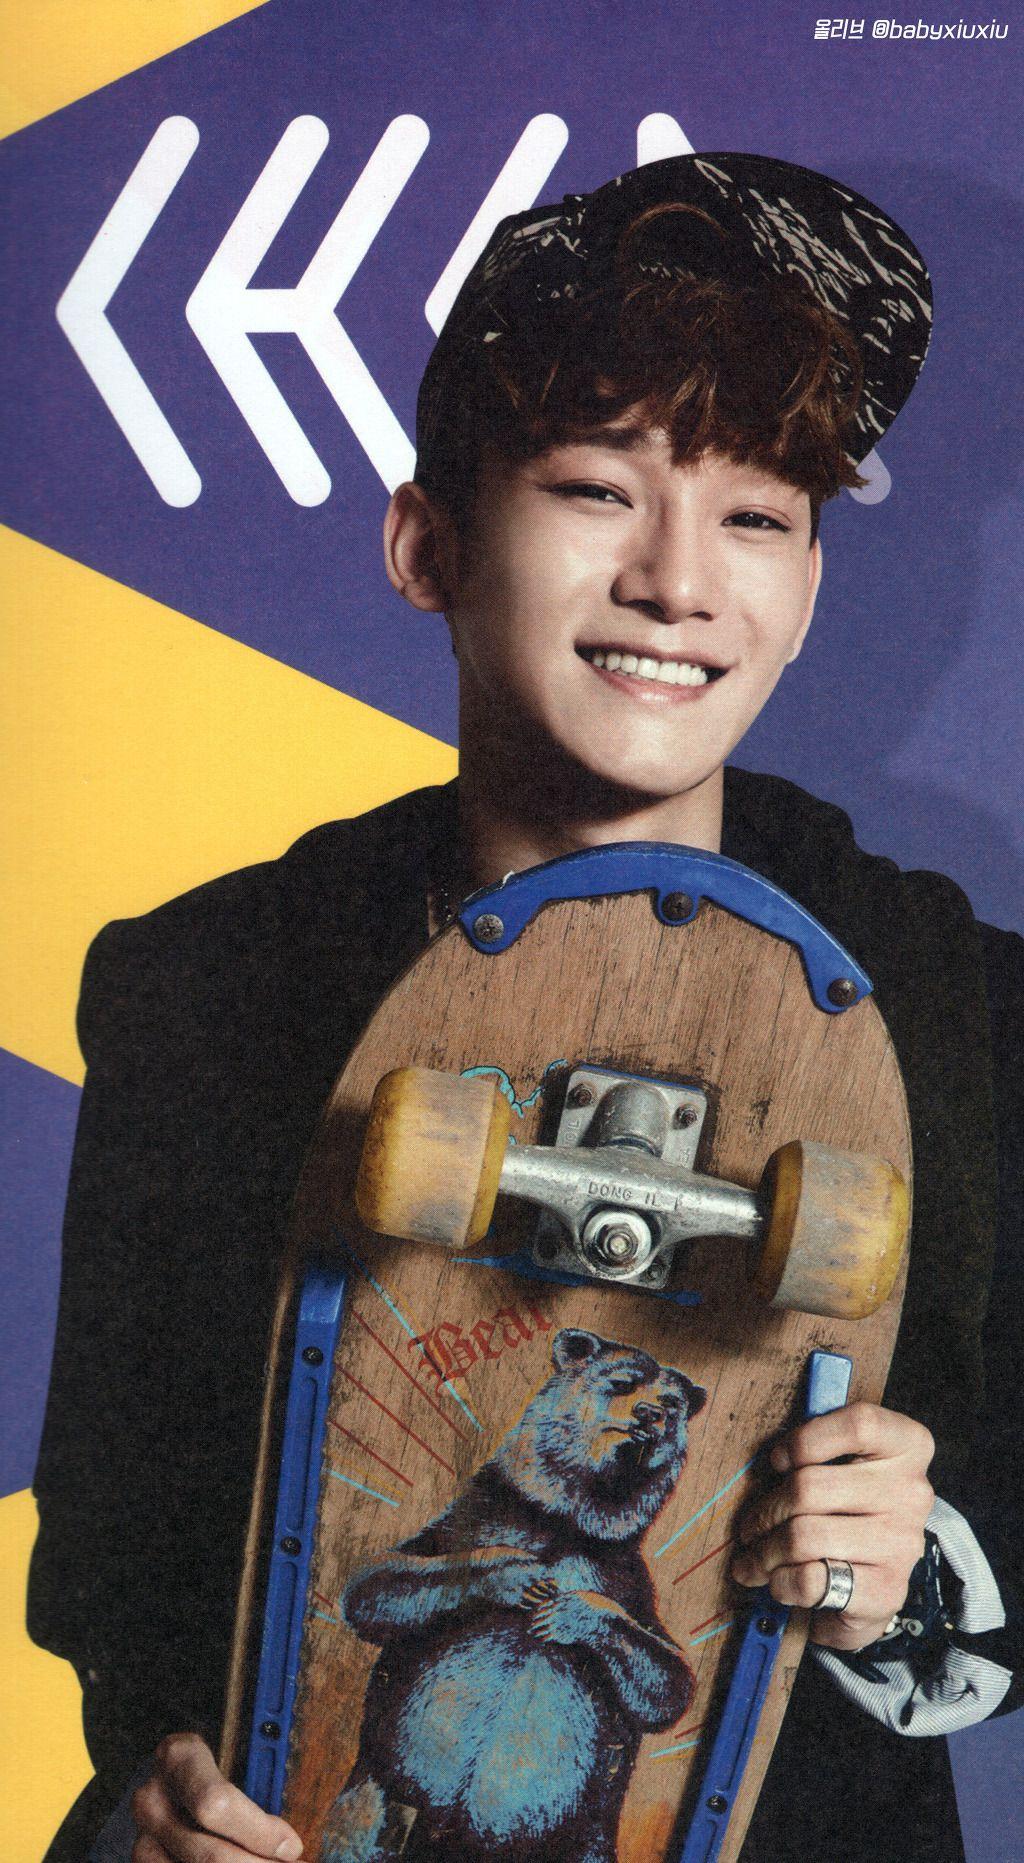 [SCAN/HQ] EXO 2014 season's greeting scheduler (width 2000 pixels) :: OliV*올리브